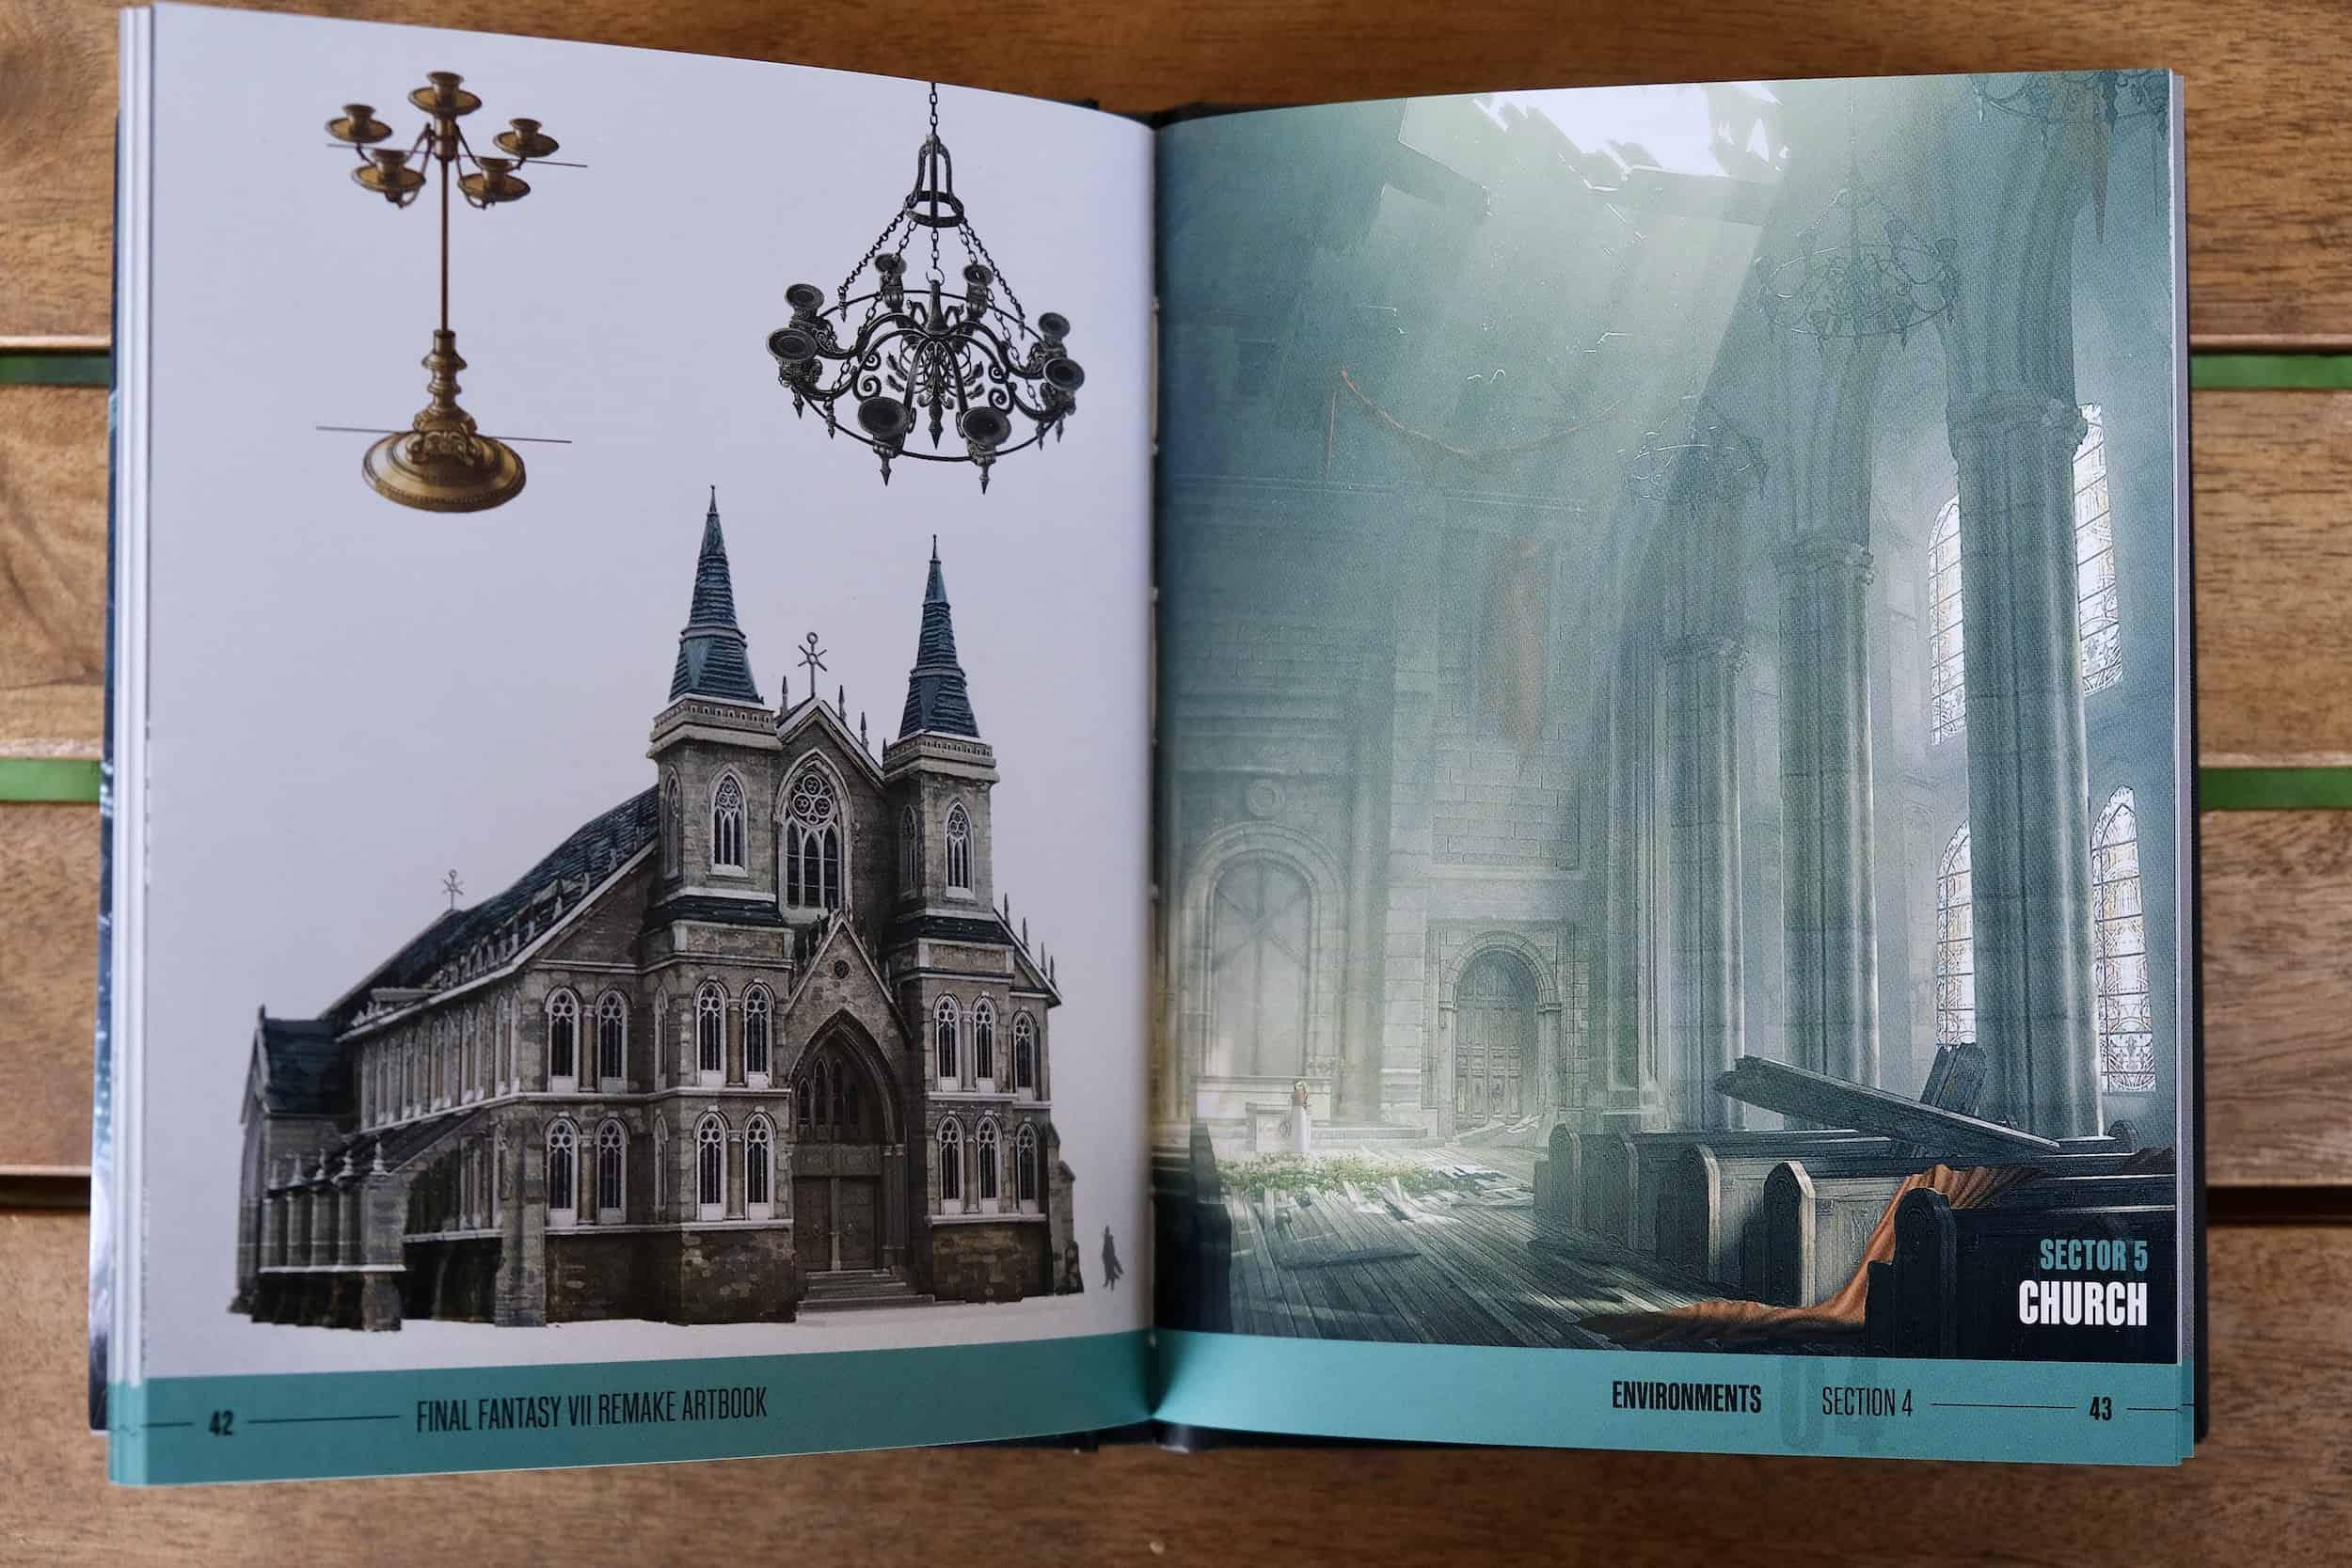 Artbook, Chiesa, Final Fantasy VII Remake